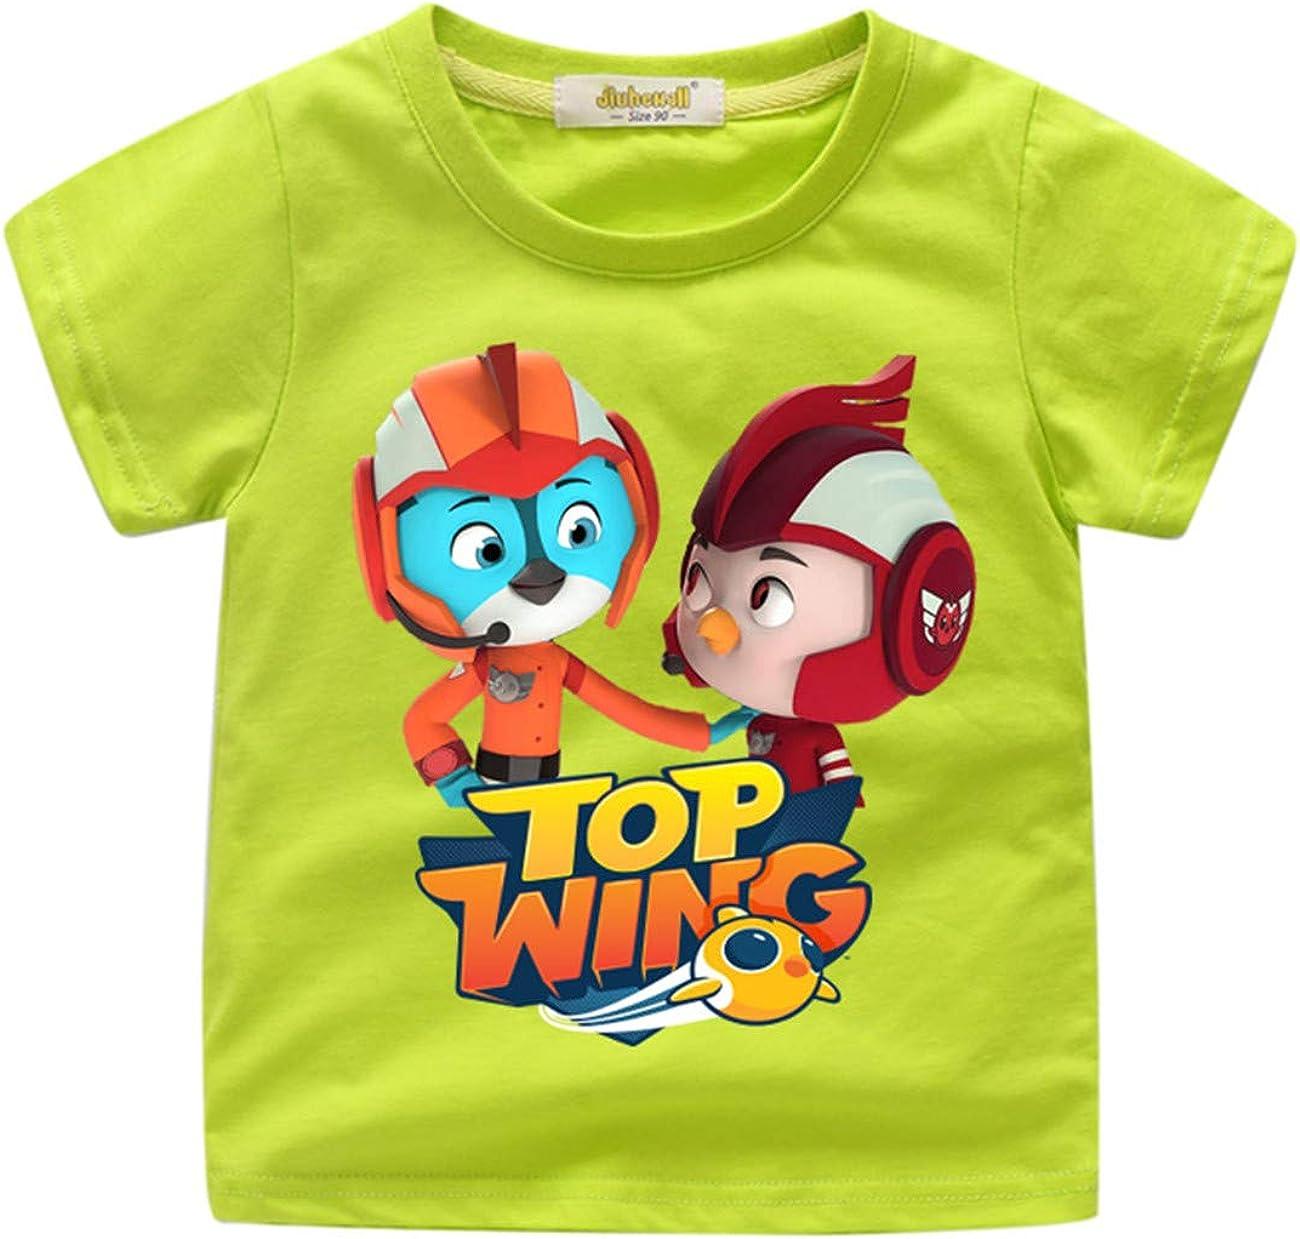 GD-fashion Kids Top Wing Tshirts-100% Soft Cotton Short Shirts Tees-Summer Short Sleeve T-Shirt for Boys Girls